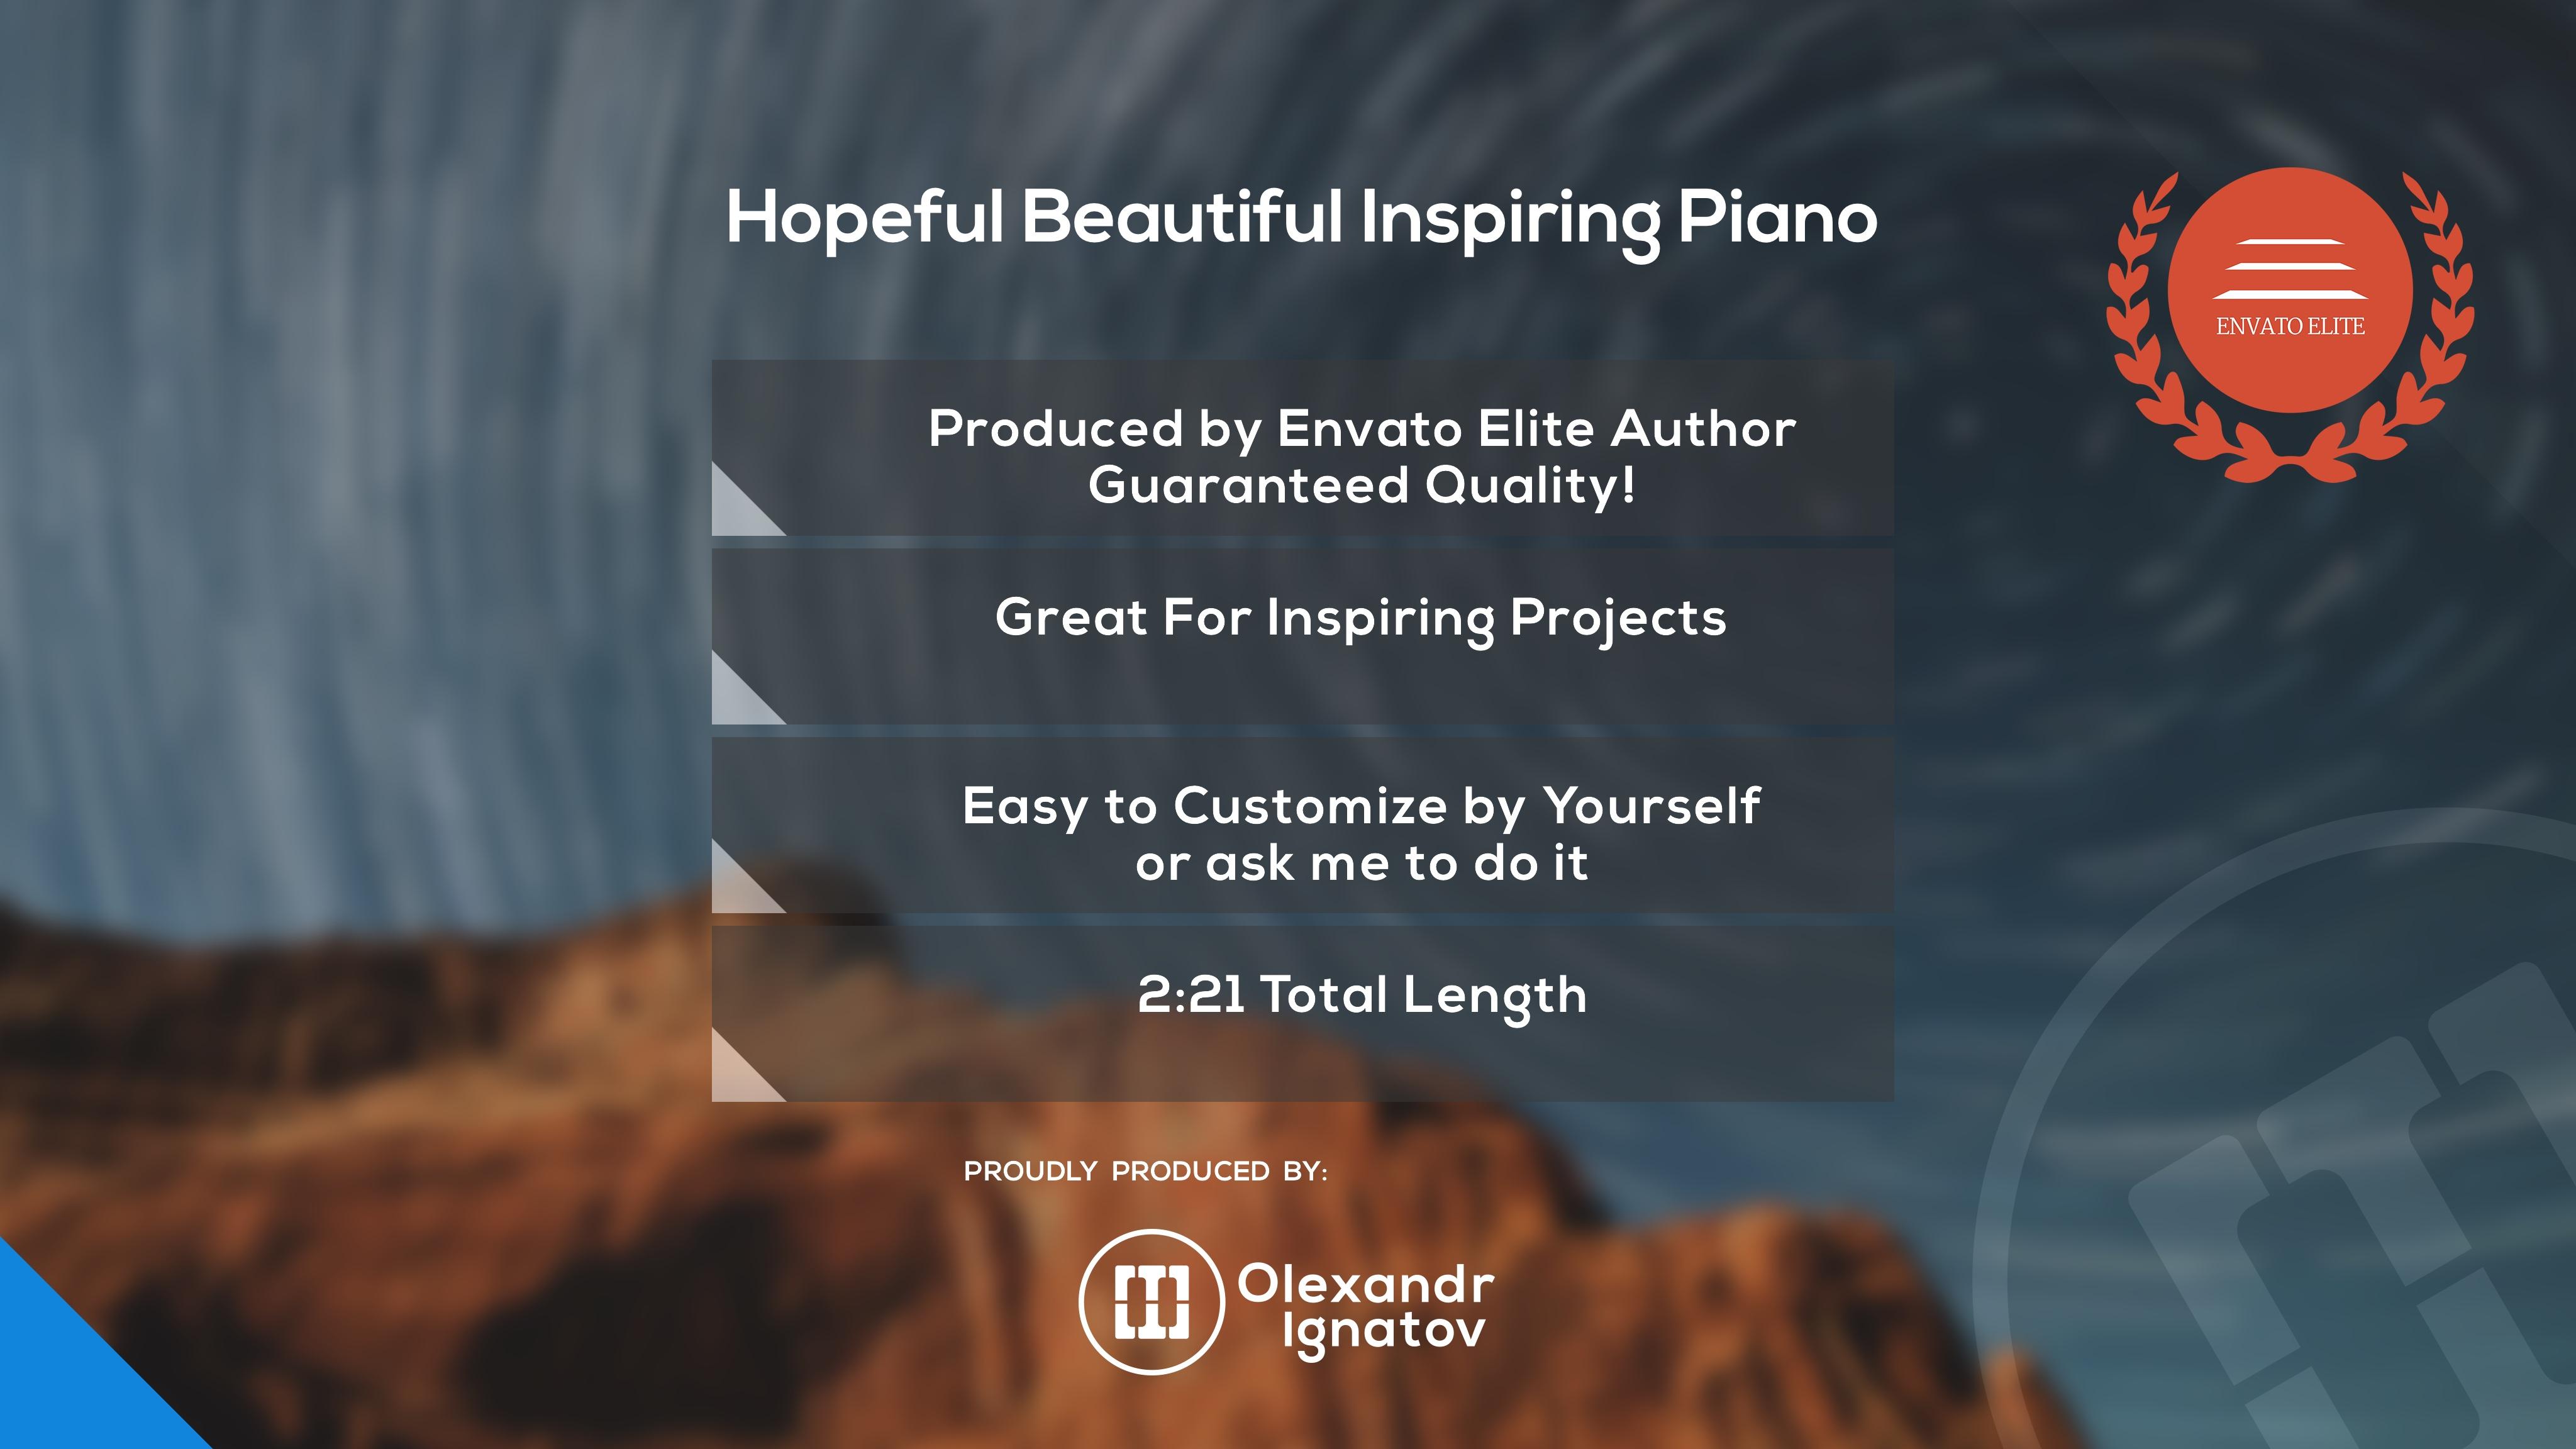 Romantic Inspiring Piano - 2